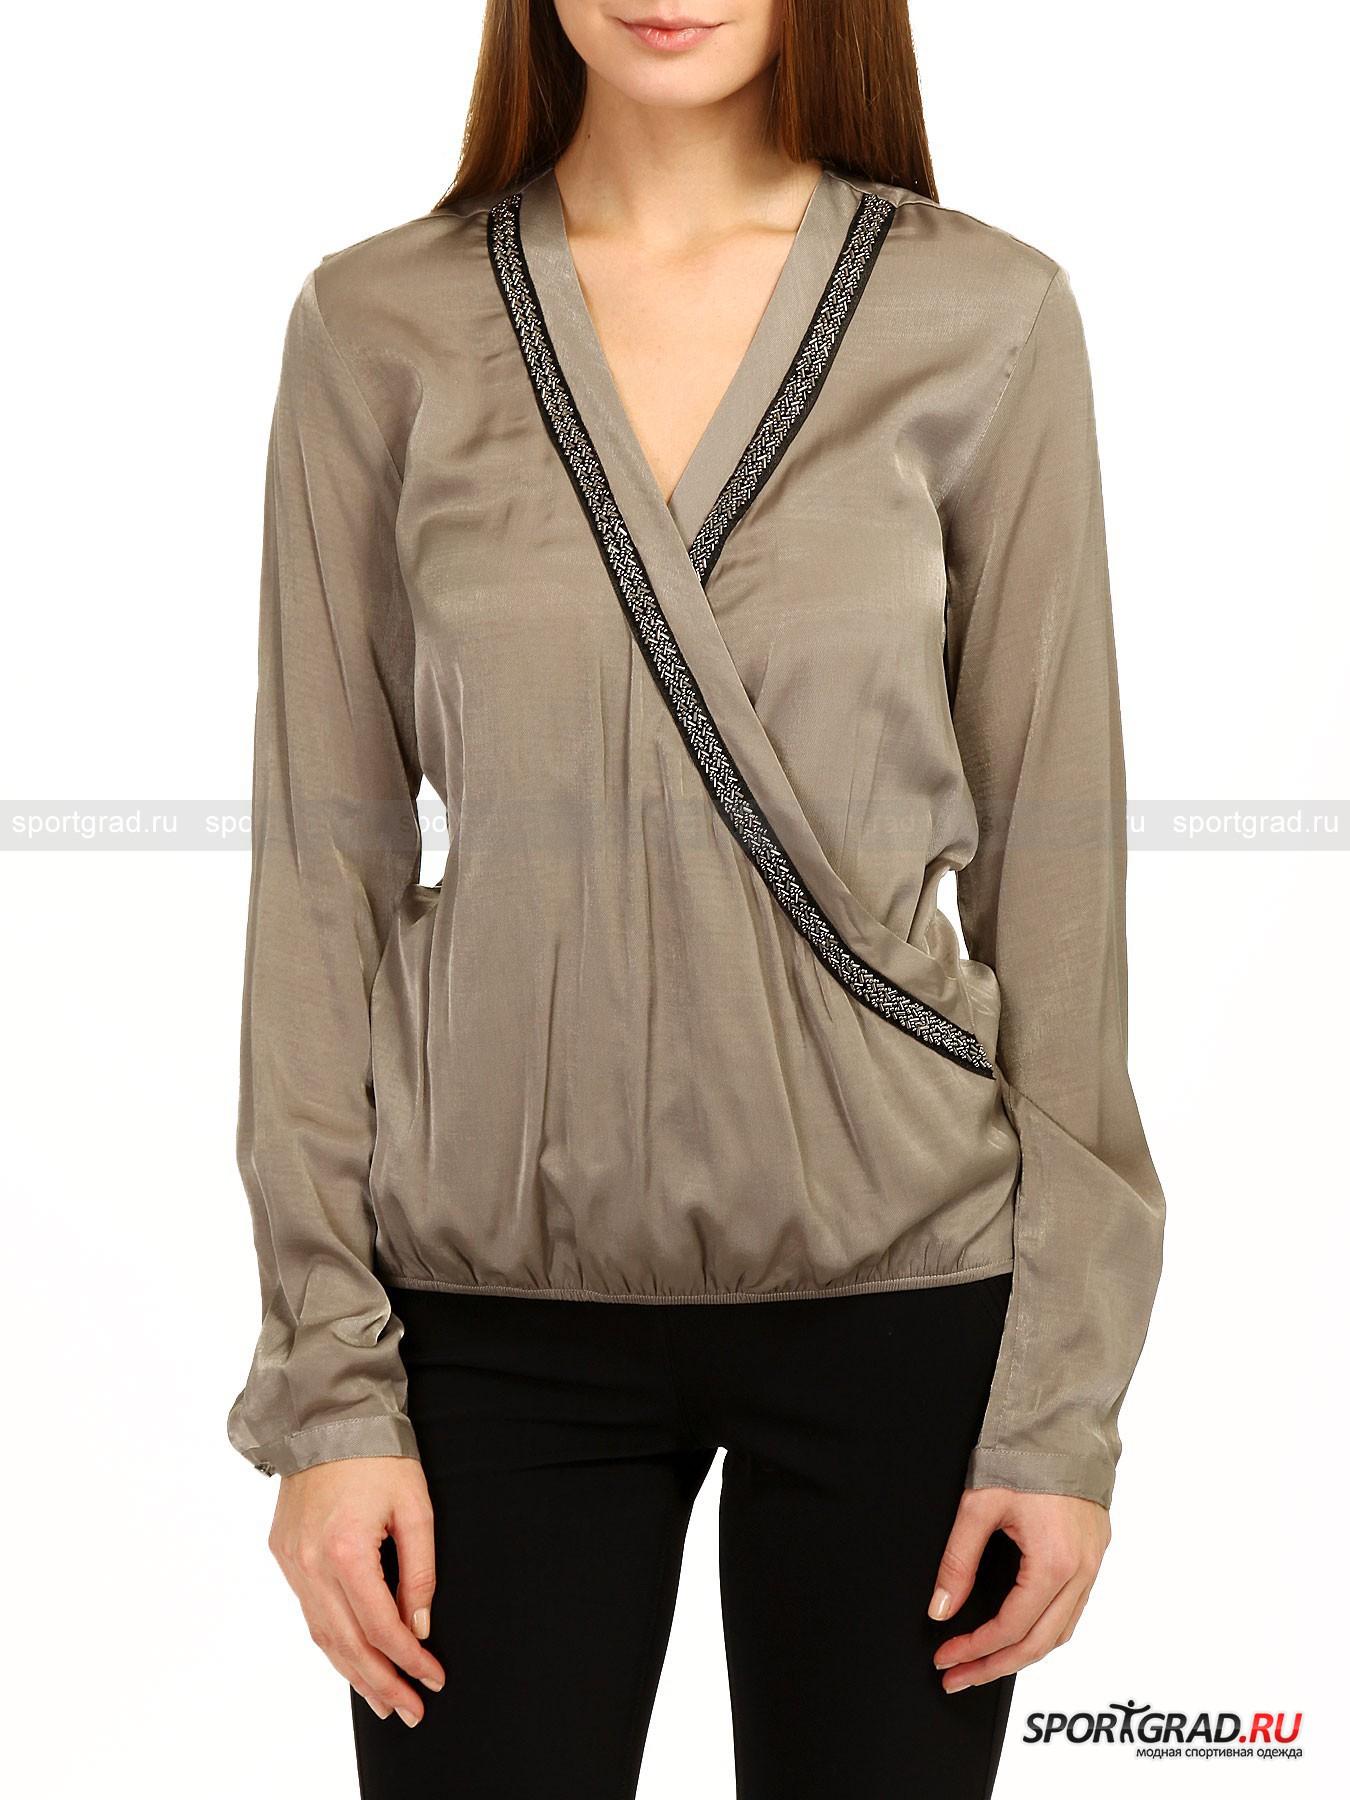 Блузка женская Safer SPORTALM с имитацией запаха